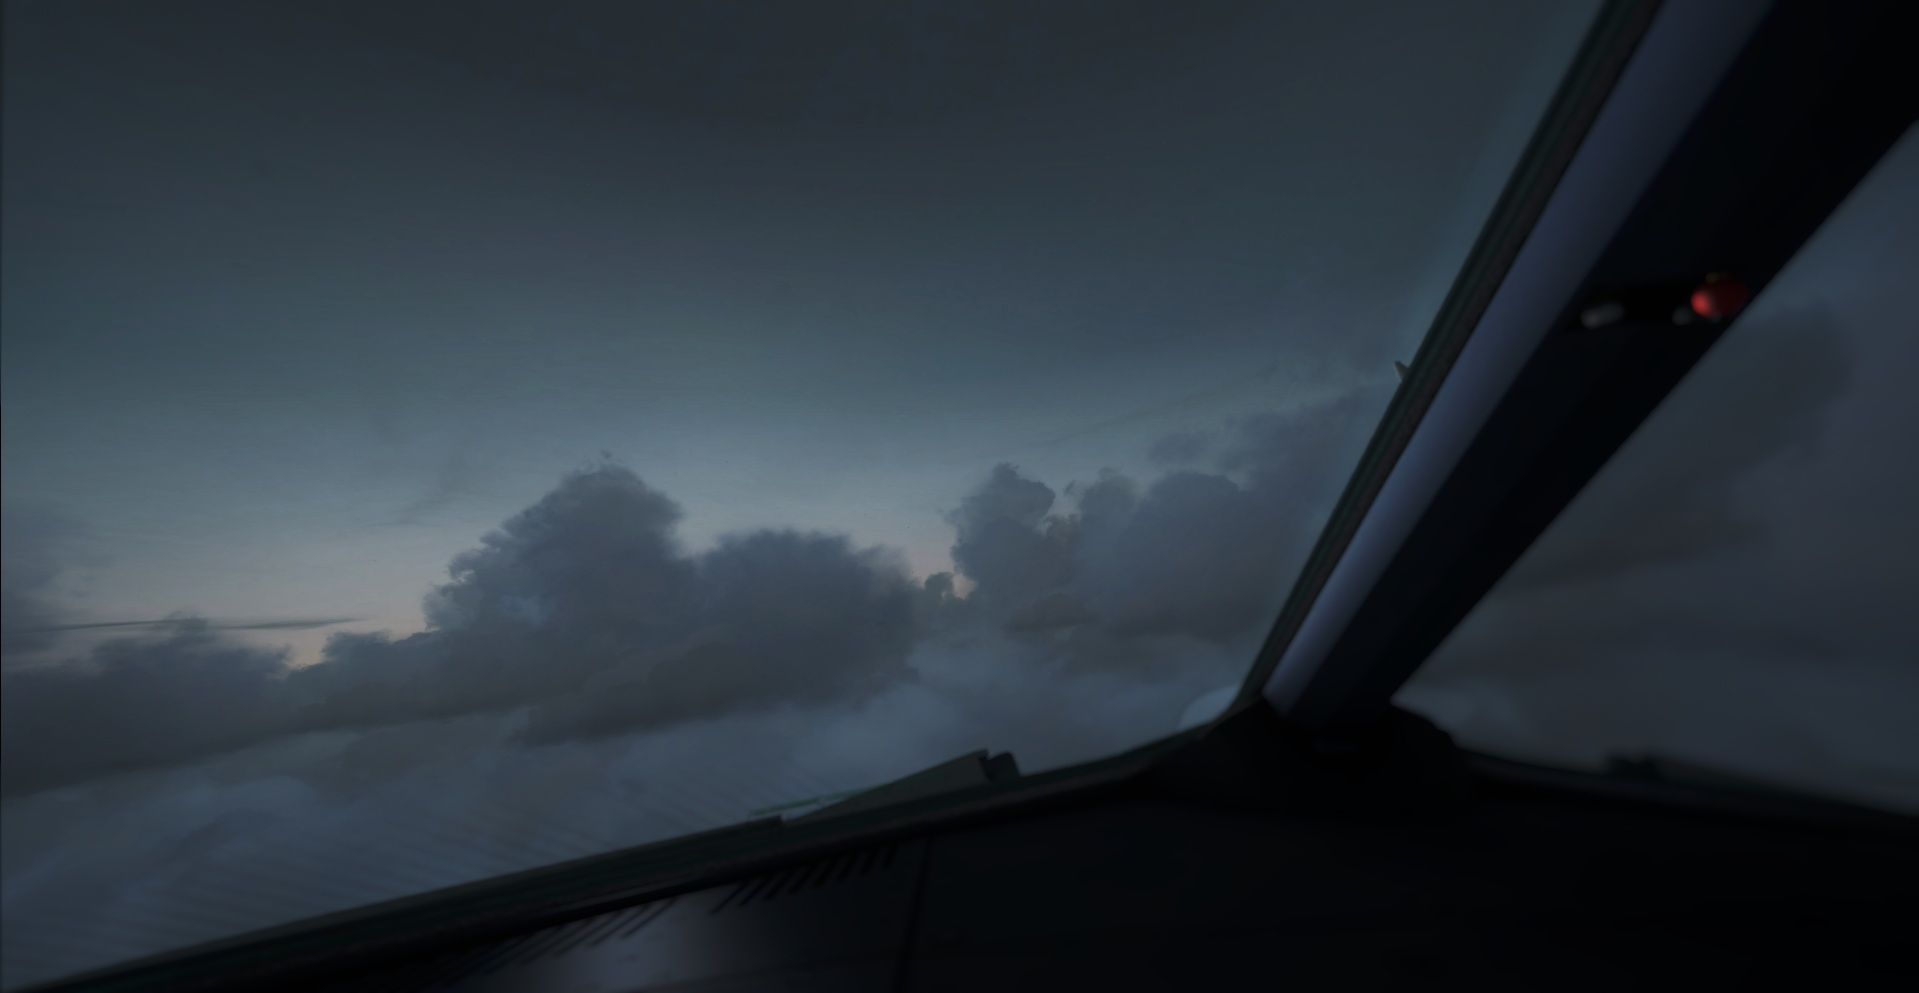 LSZH - OMDB, Deadly clouds